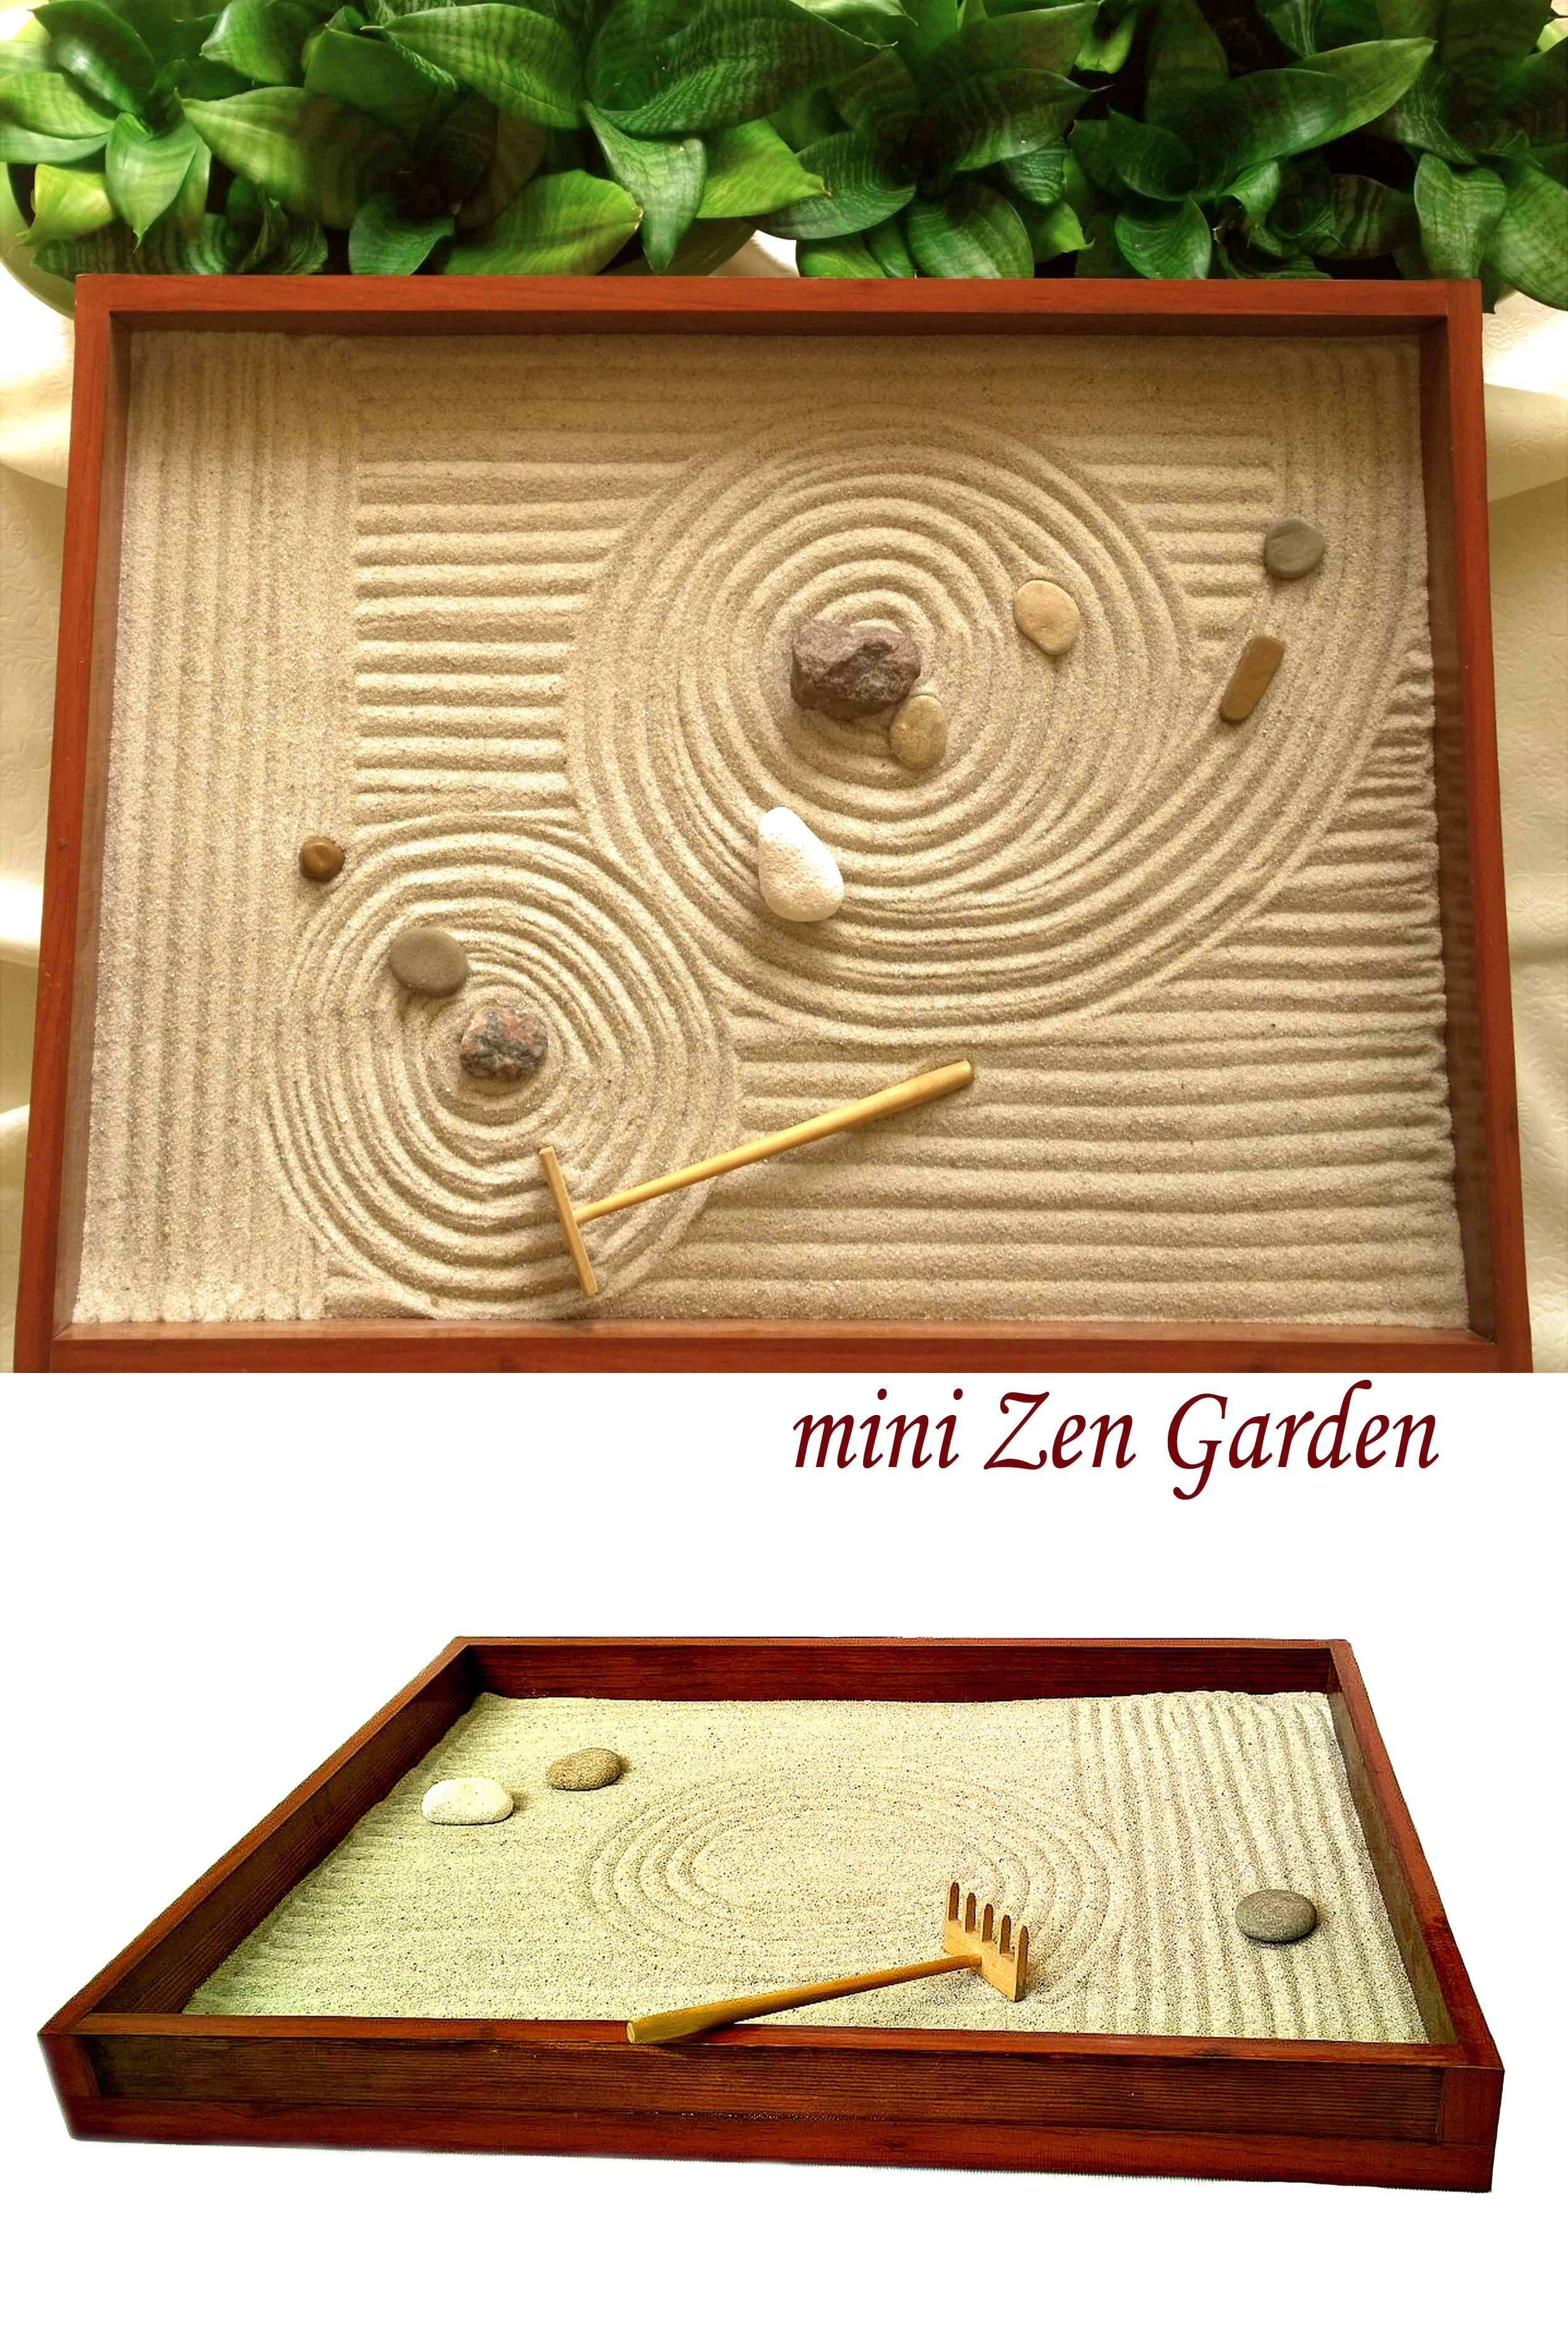 Natural Wood Handmade Zen Garden Perfect Decorative Iteam For Home Or Office Rakes Stones And Sand Are Also Incl Zen Garden Meditation Gifts Mini Zen Garden